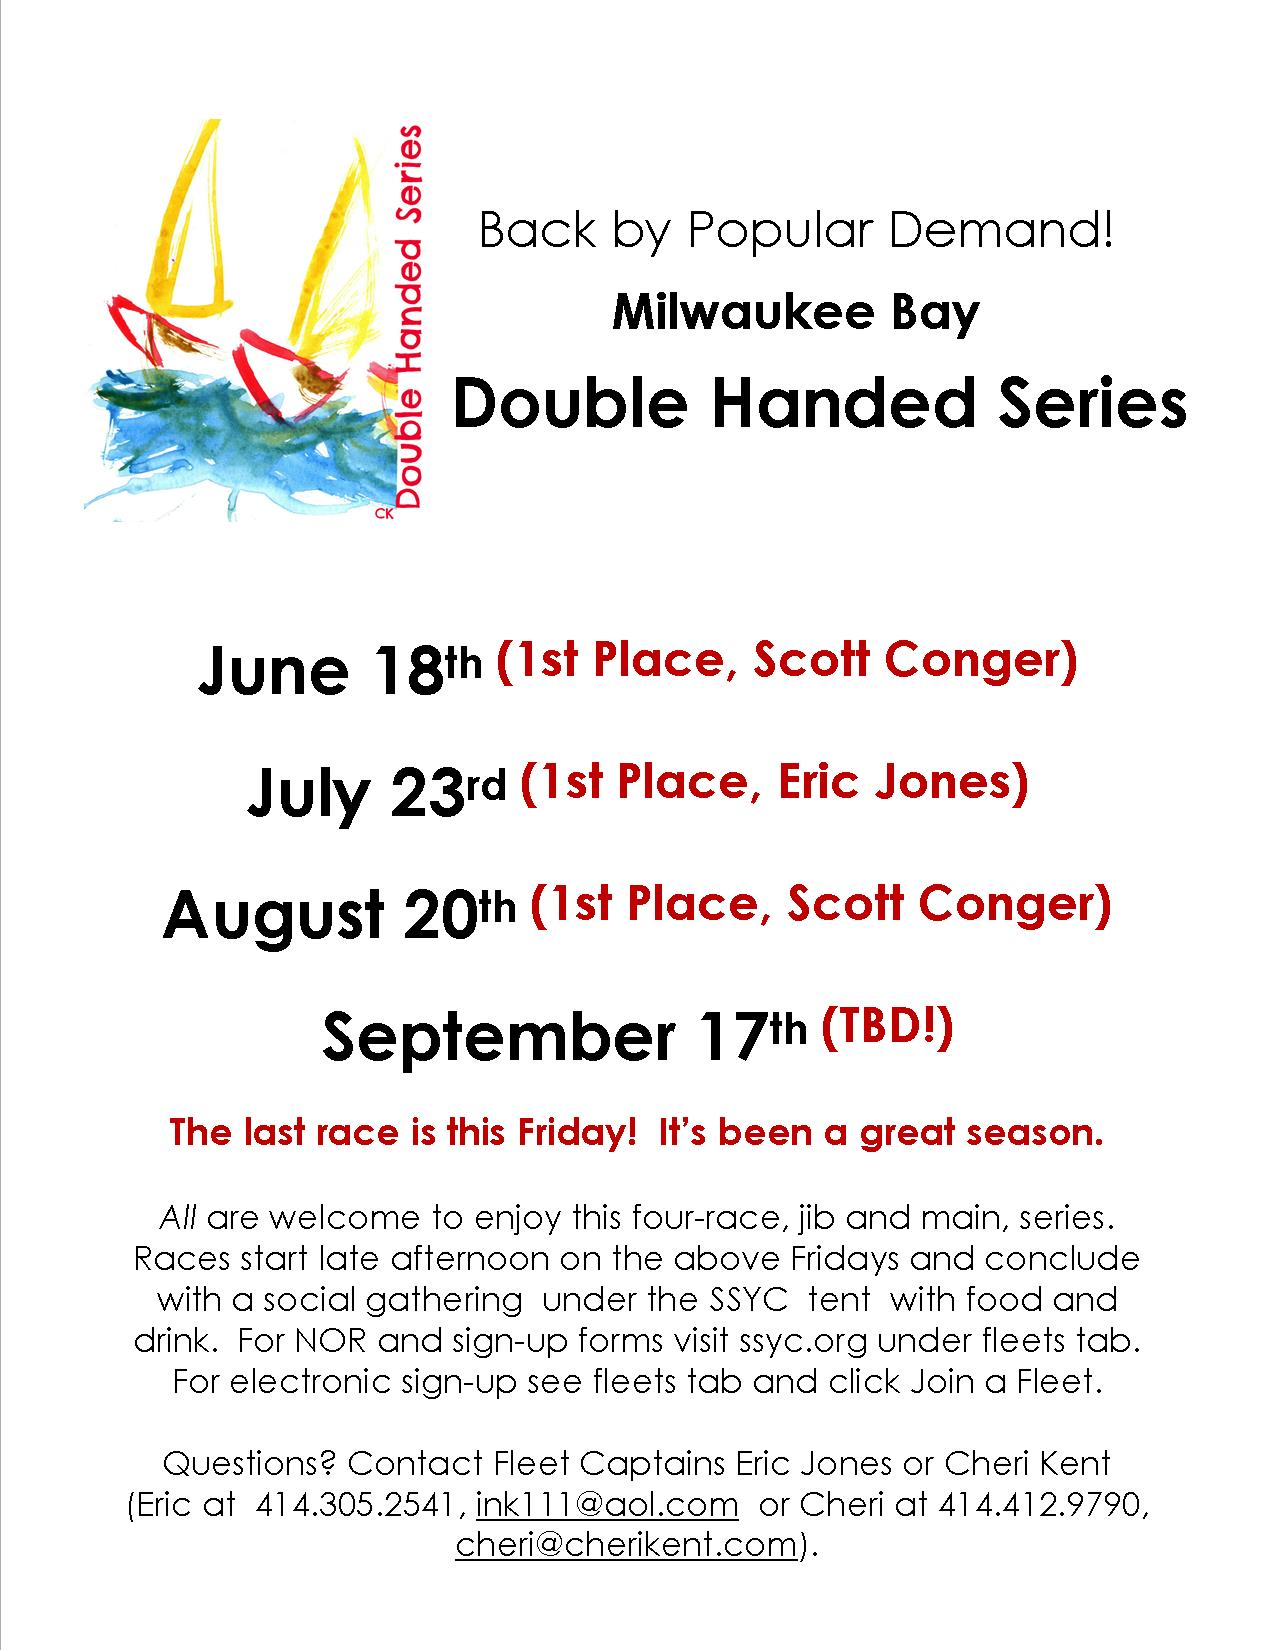 Double Hand Flyer Promo Update